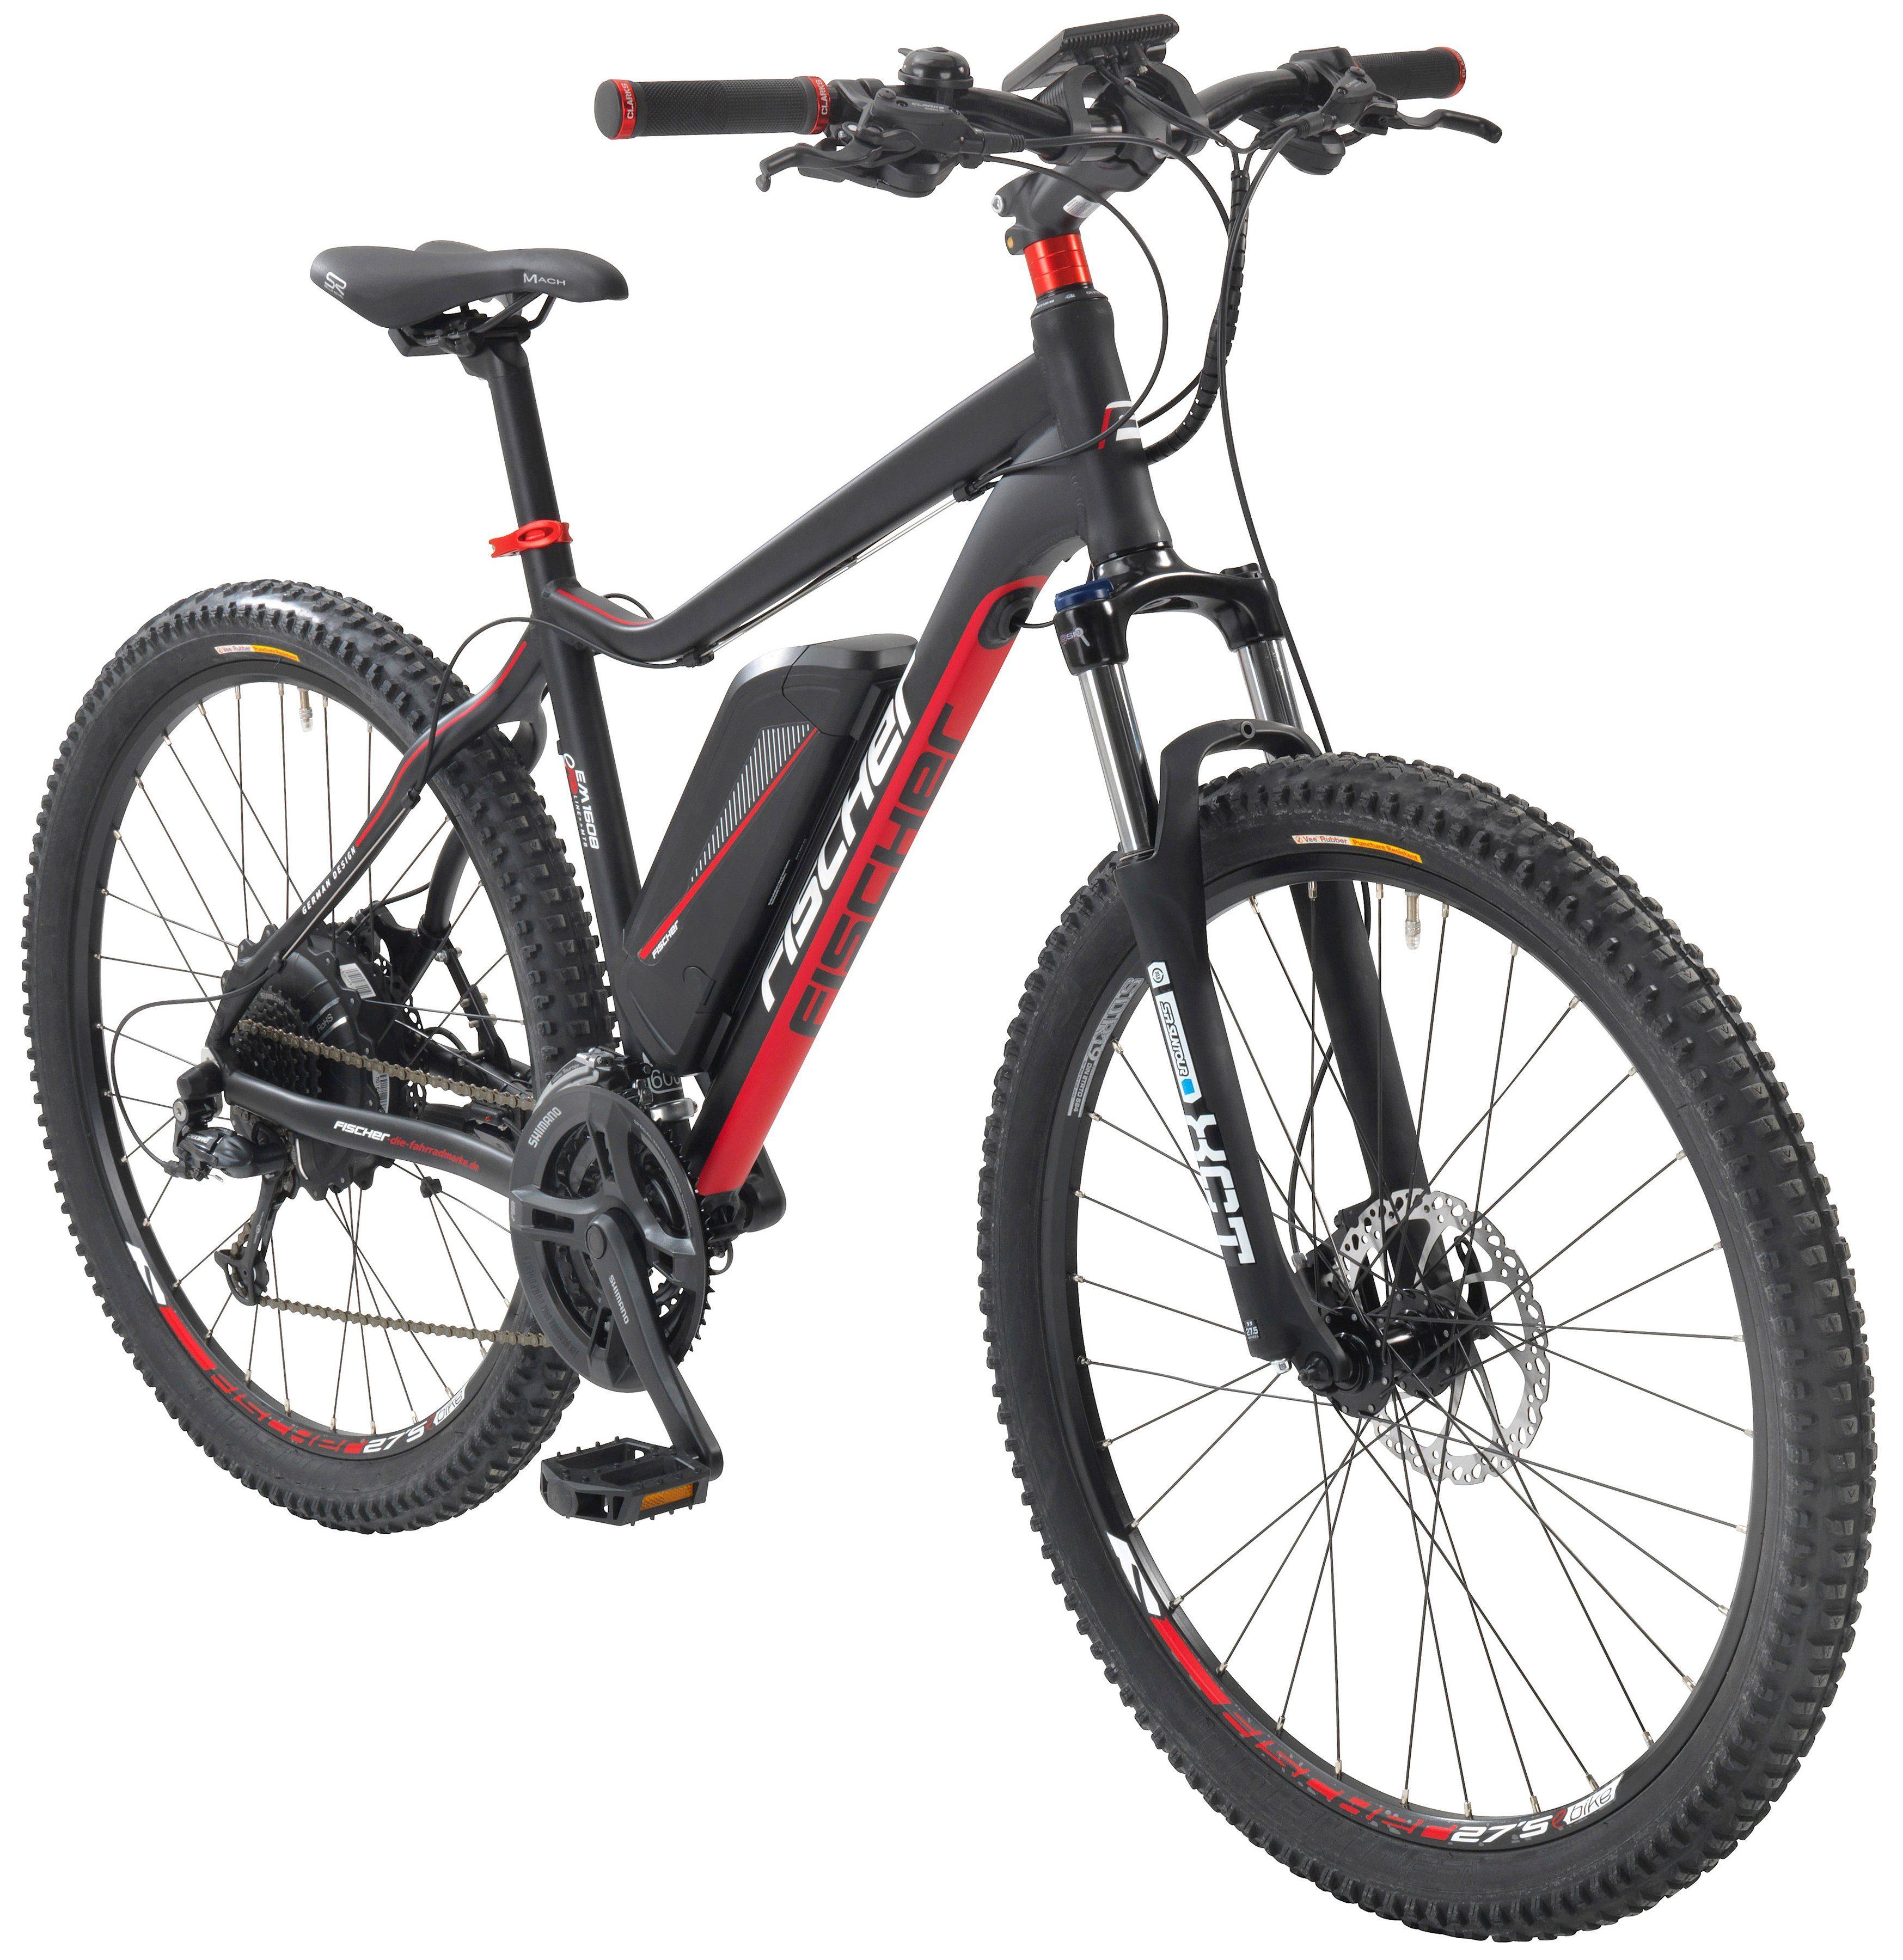 FISCHER FAHRRAEDER E-Bike Mountainbike »EM 1608«, 27,5 Zoll, 24 Gang, Heckmotor, 418 Wh